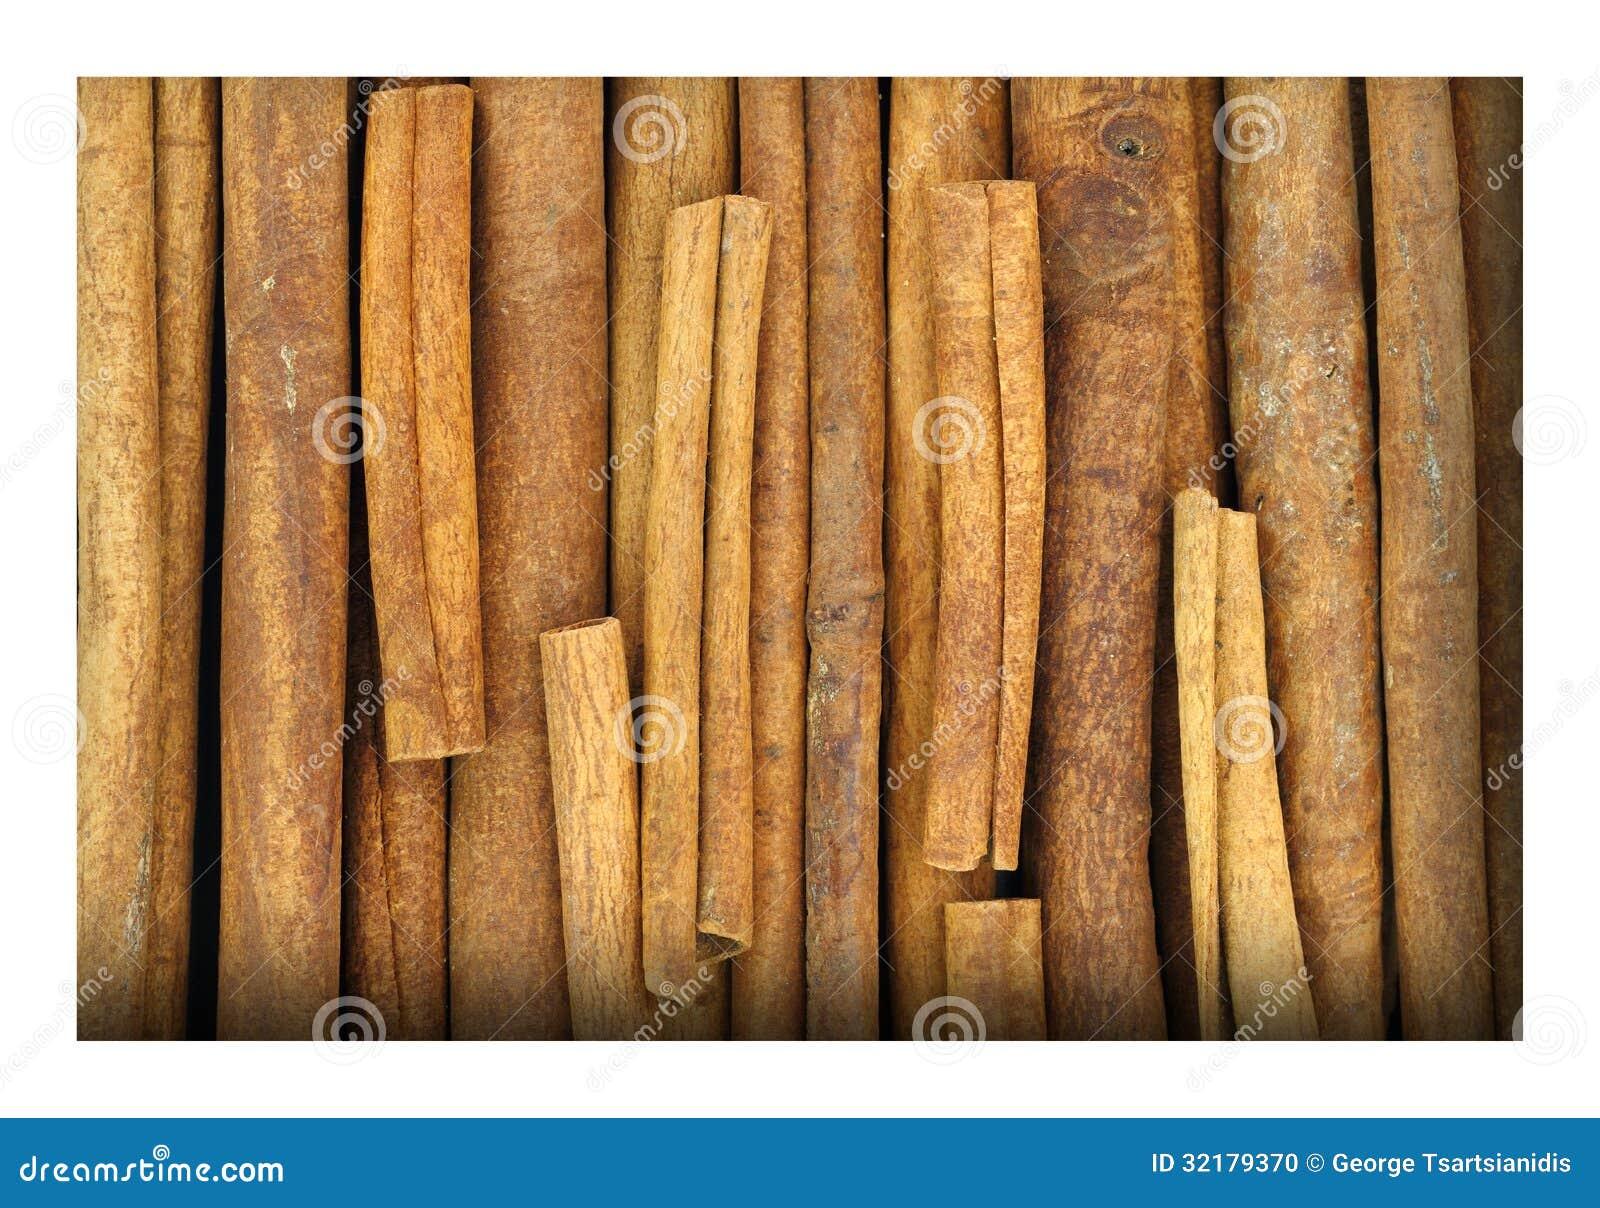 how to break up cinnamon sticks